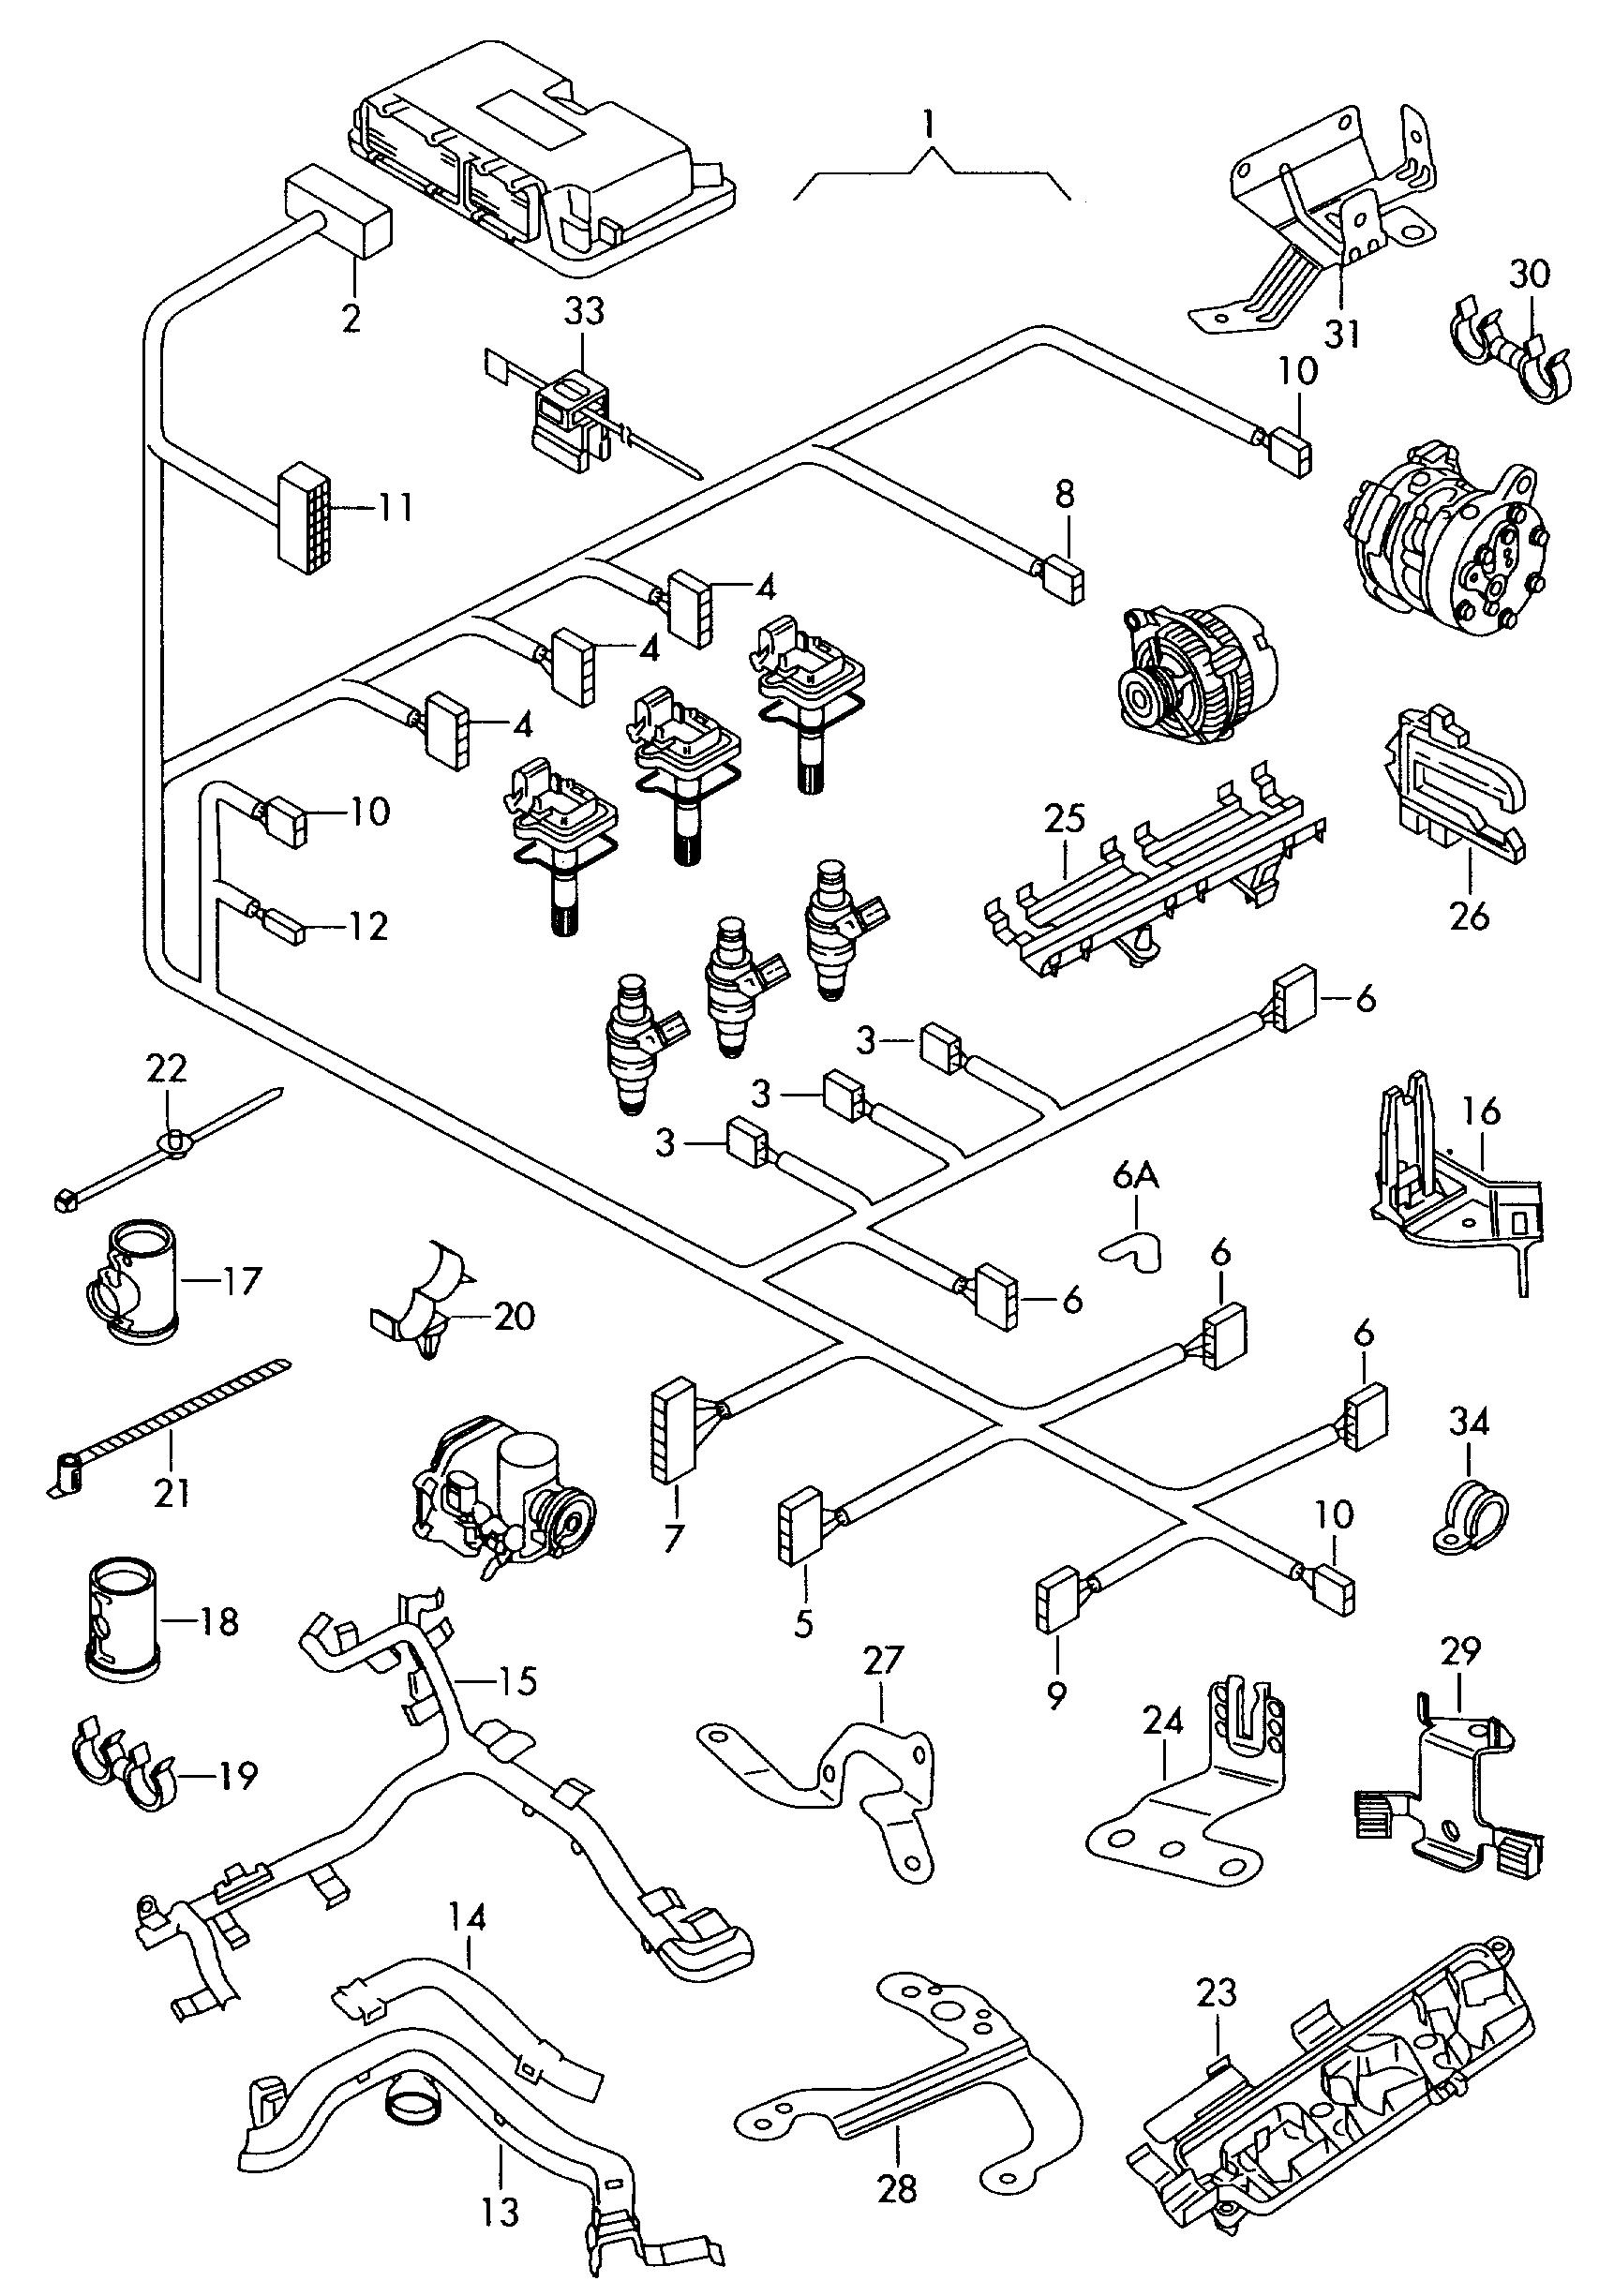 skoda fabia (2009 - 2014) / vag etka